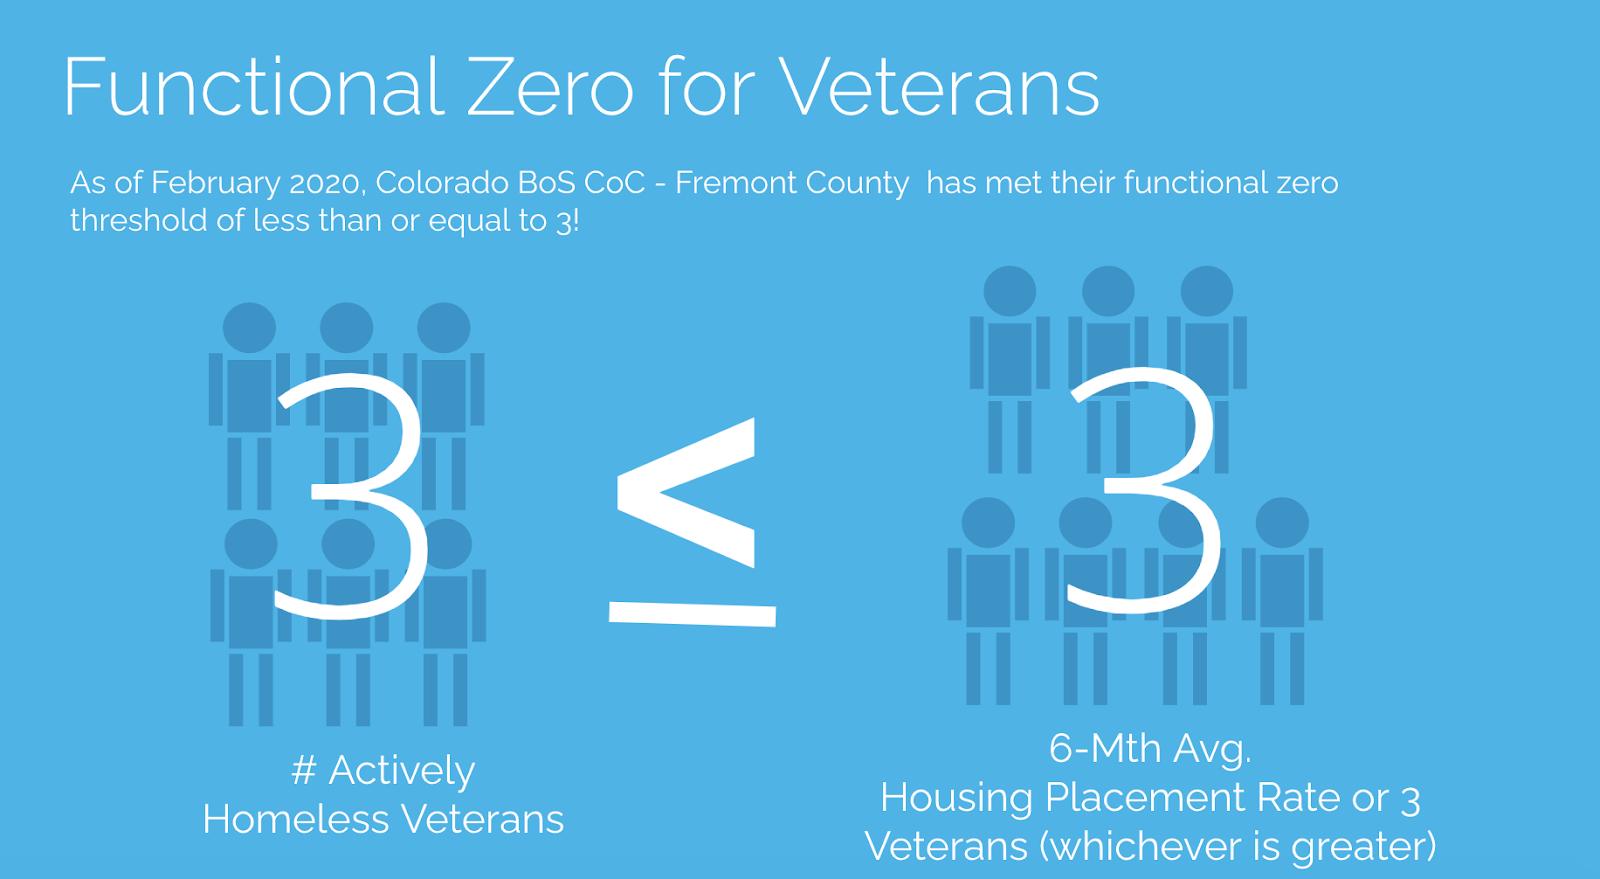 Functional Zero for Veterans Definition